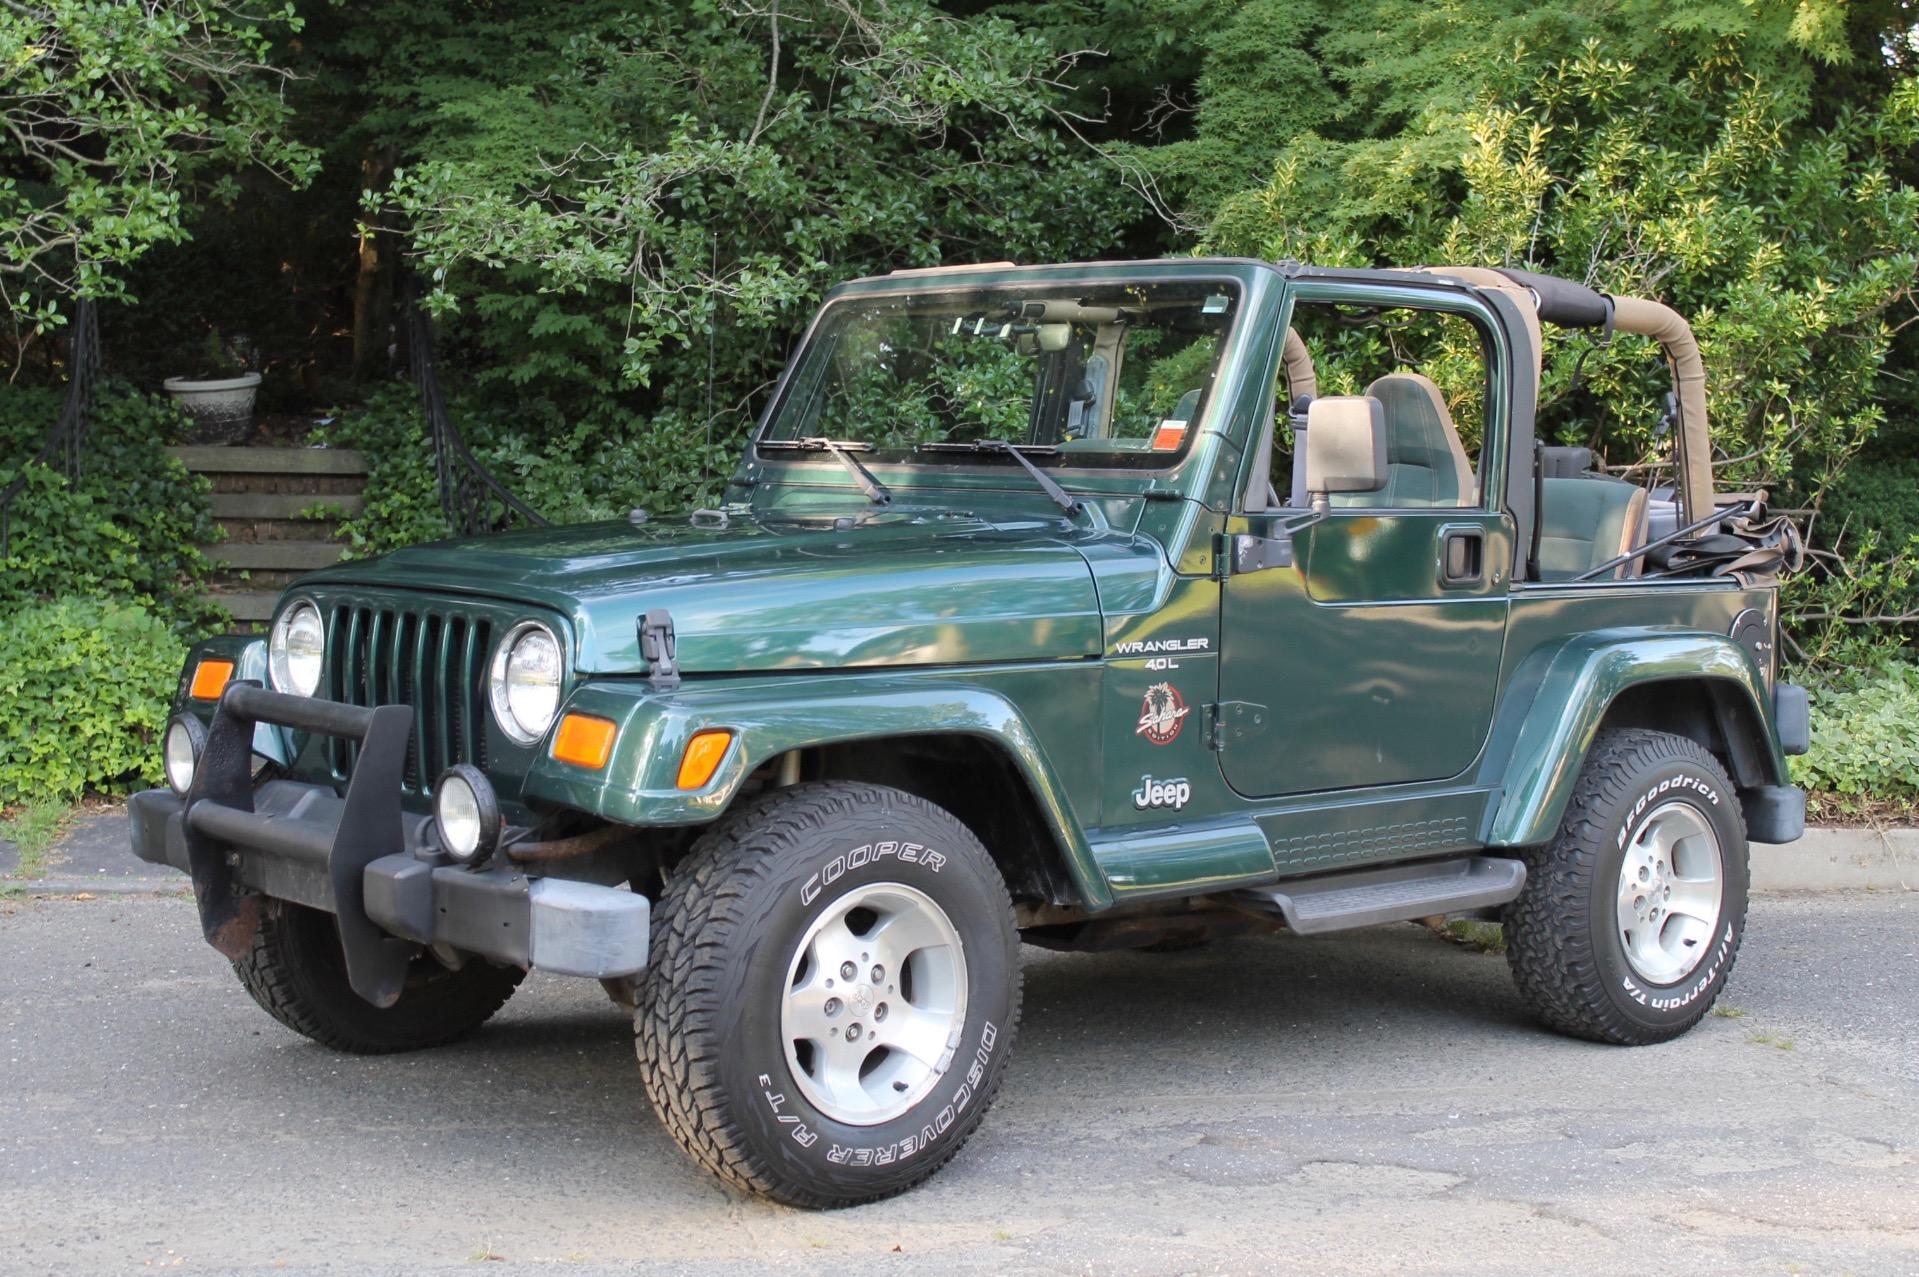 Used 1999 Jeep Wrangler Sahara Sahara For Sale   8 900